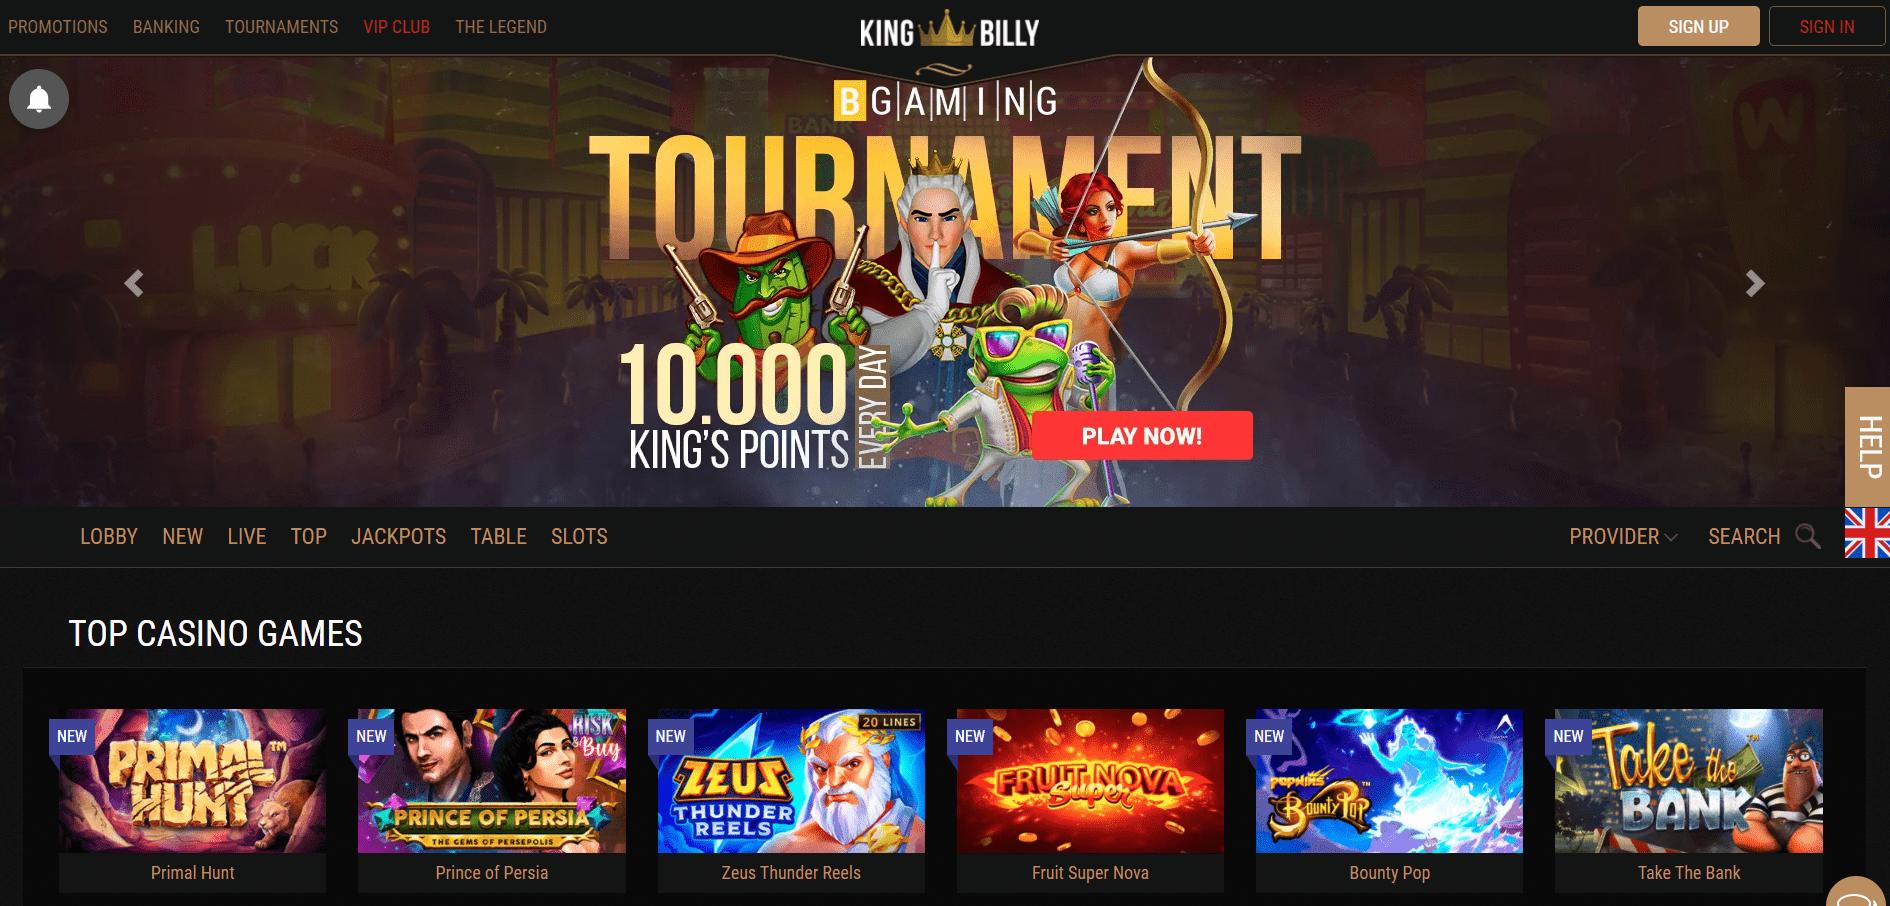 King Billy Casino Homepage